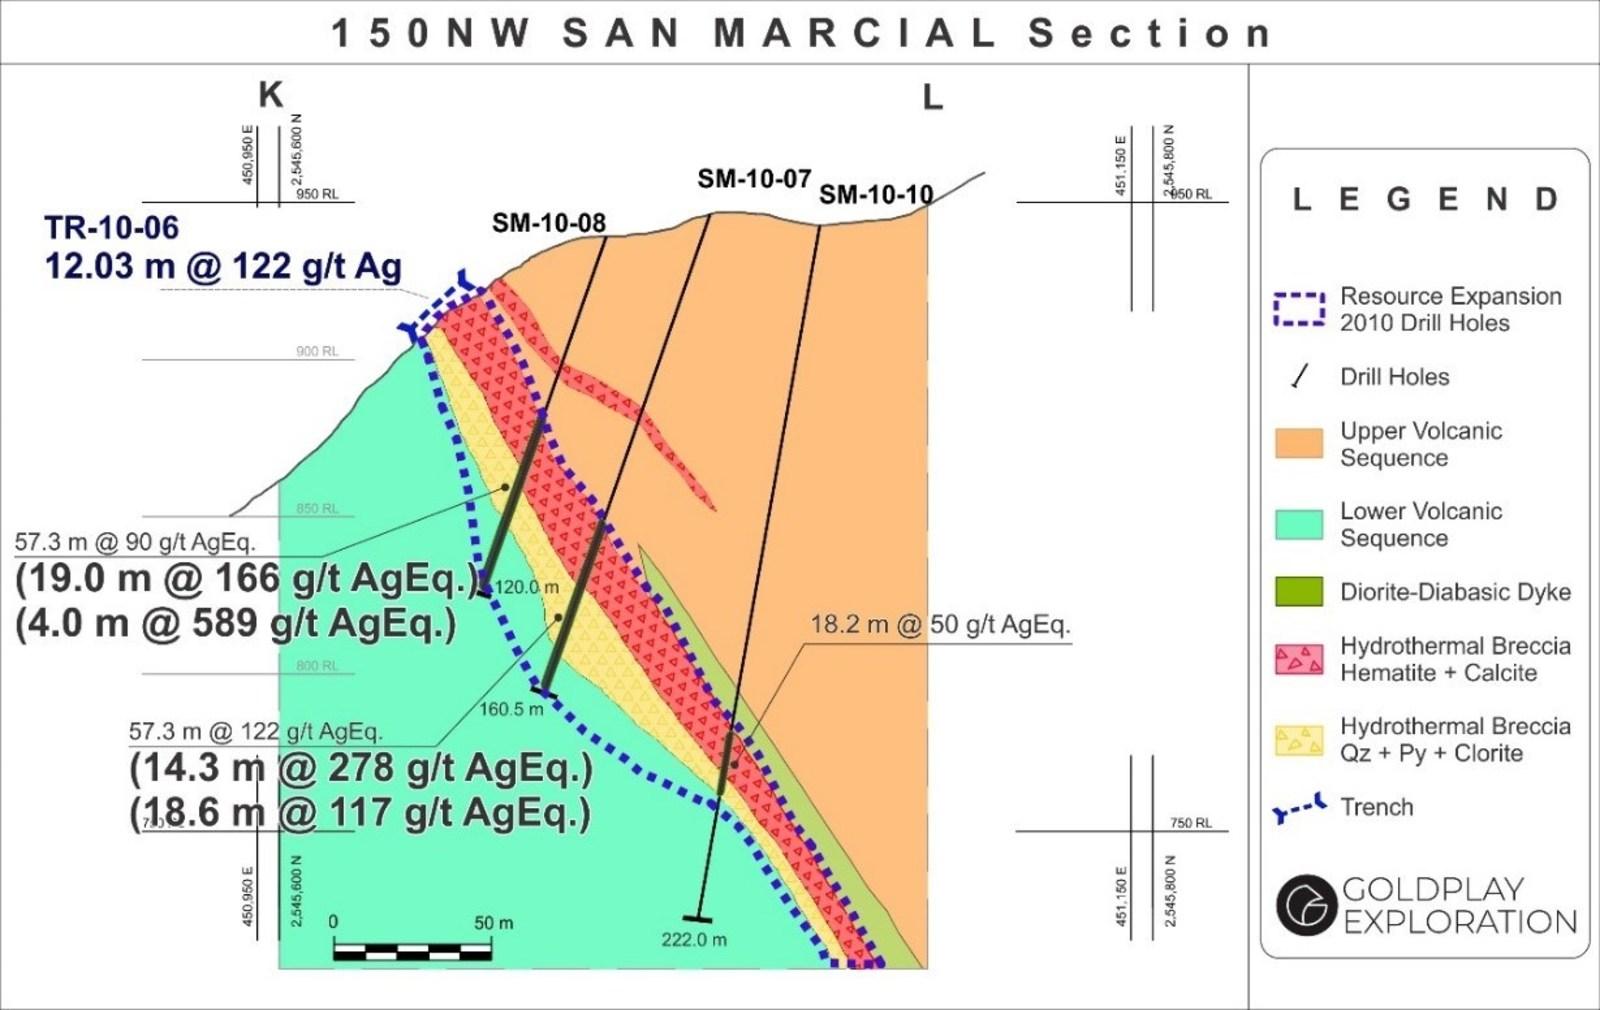 Figure 3: San Marcial Cross Section K-L